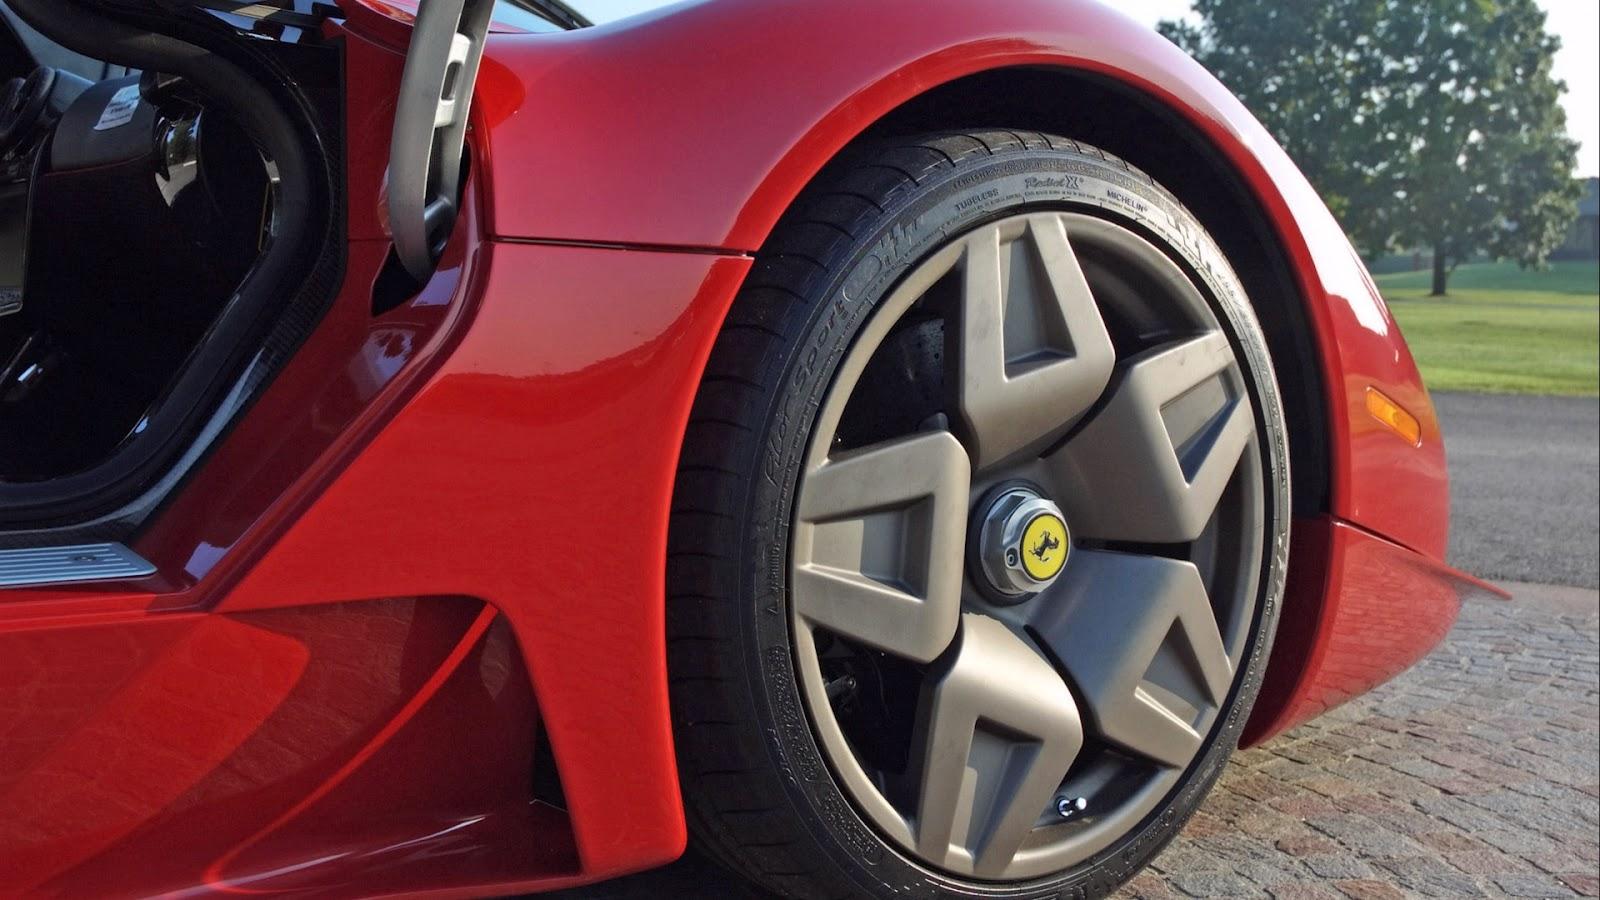 FERRARI RIMS WALLPAPERS 2012 LATEST SEXY RACE CAR   LATEST ...